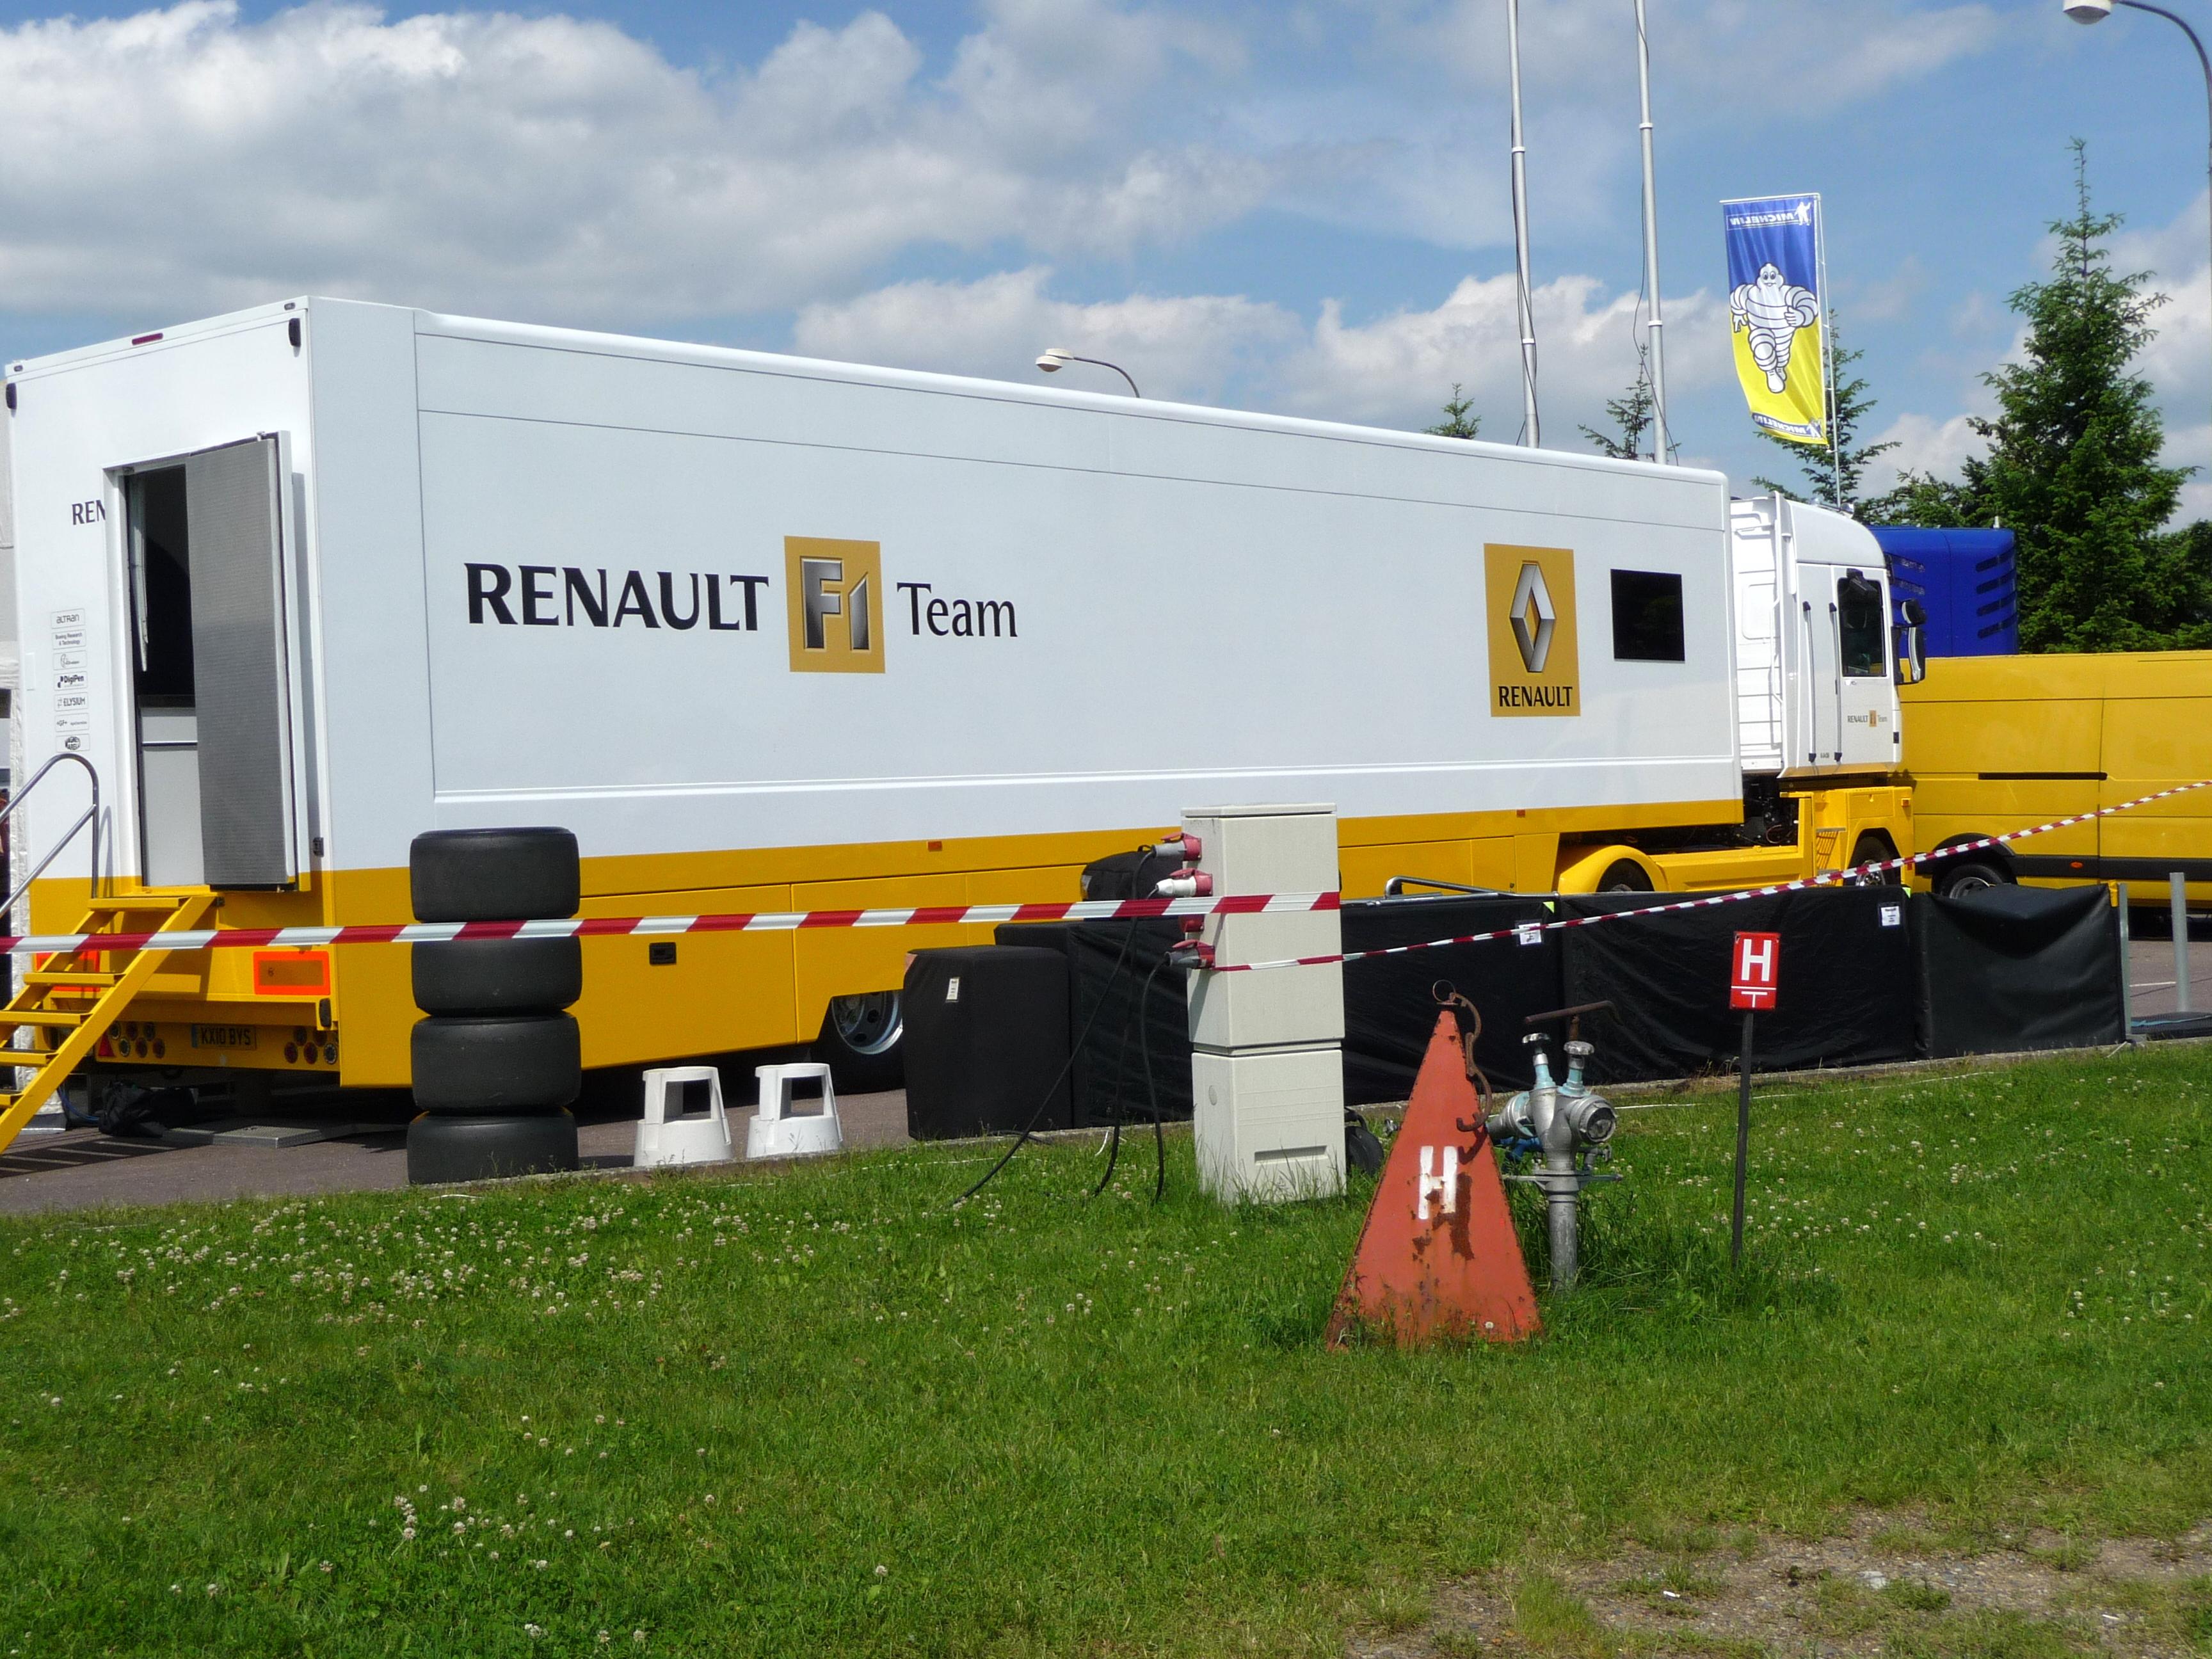 Renault Magnum f1 Team File:renault f1 Team Garage